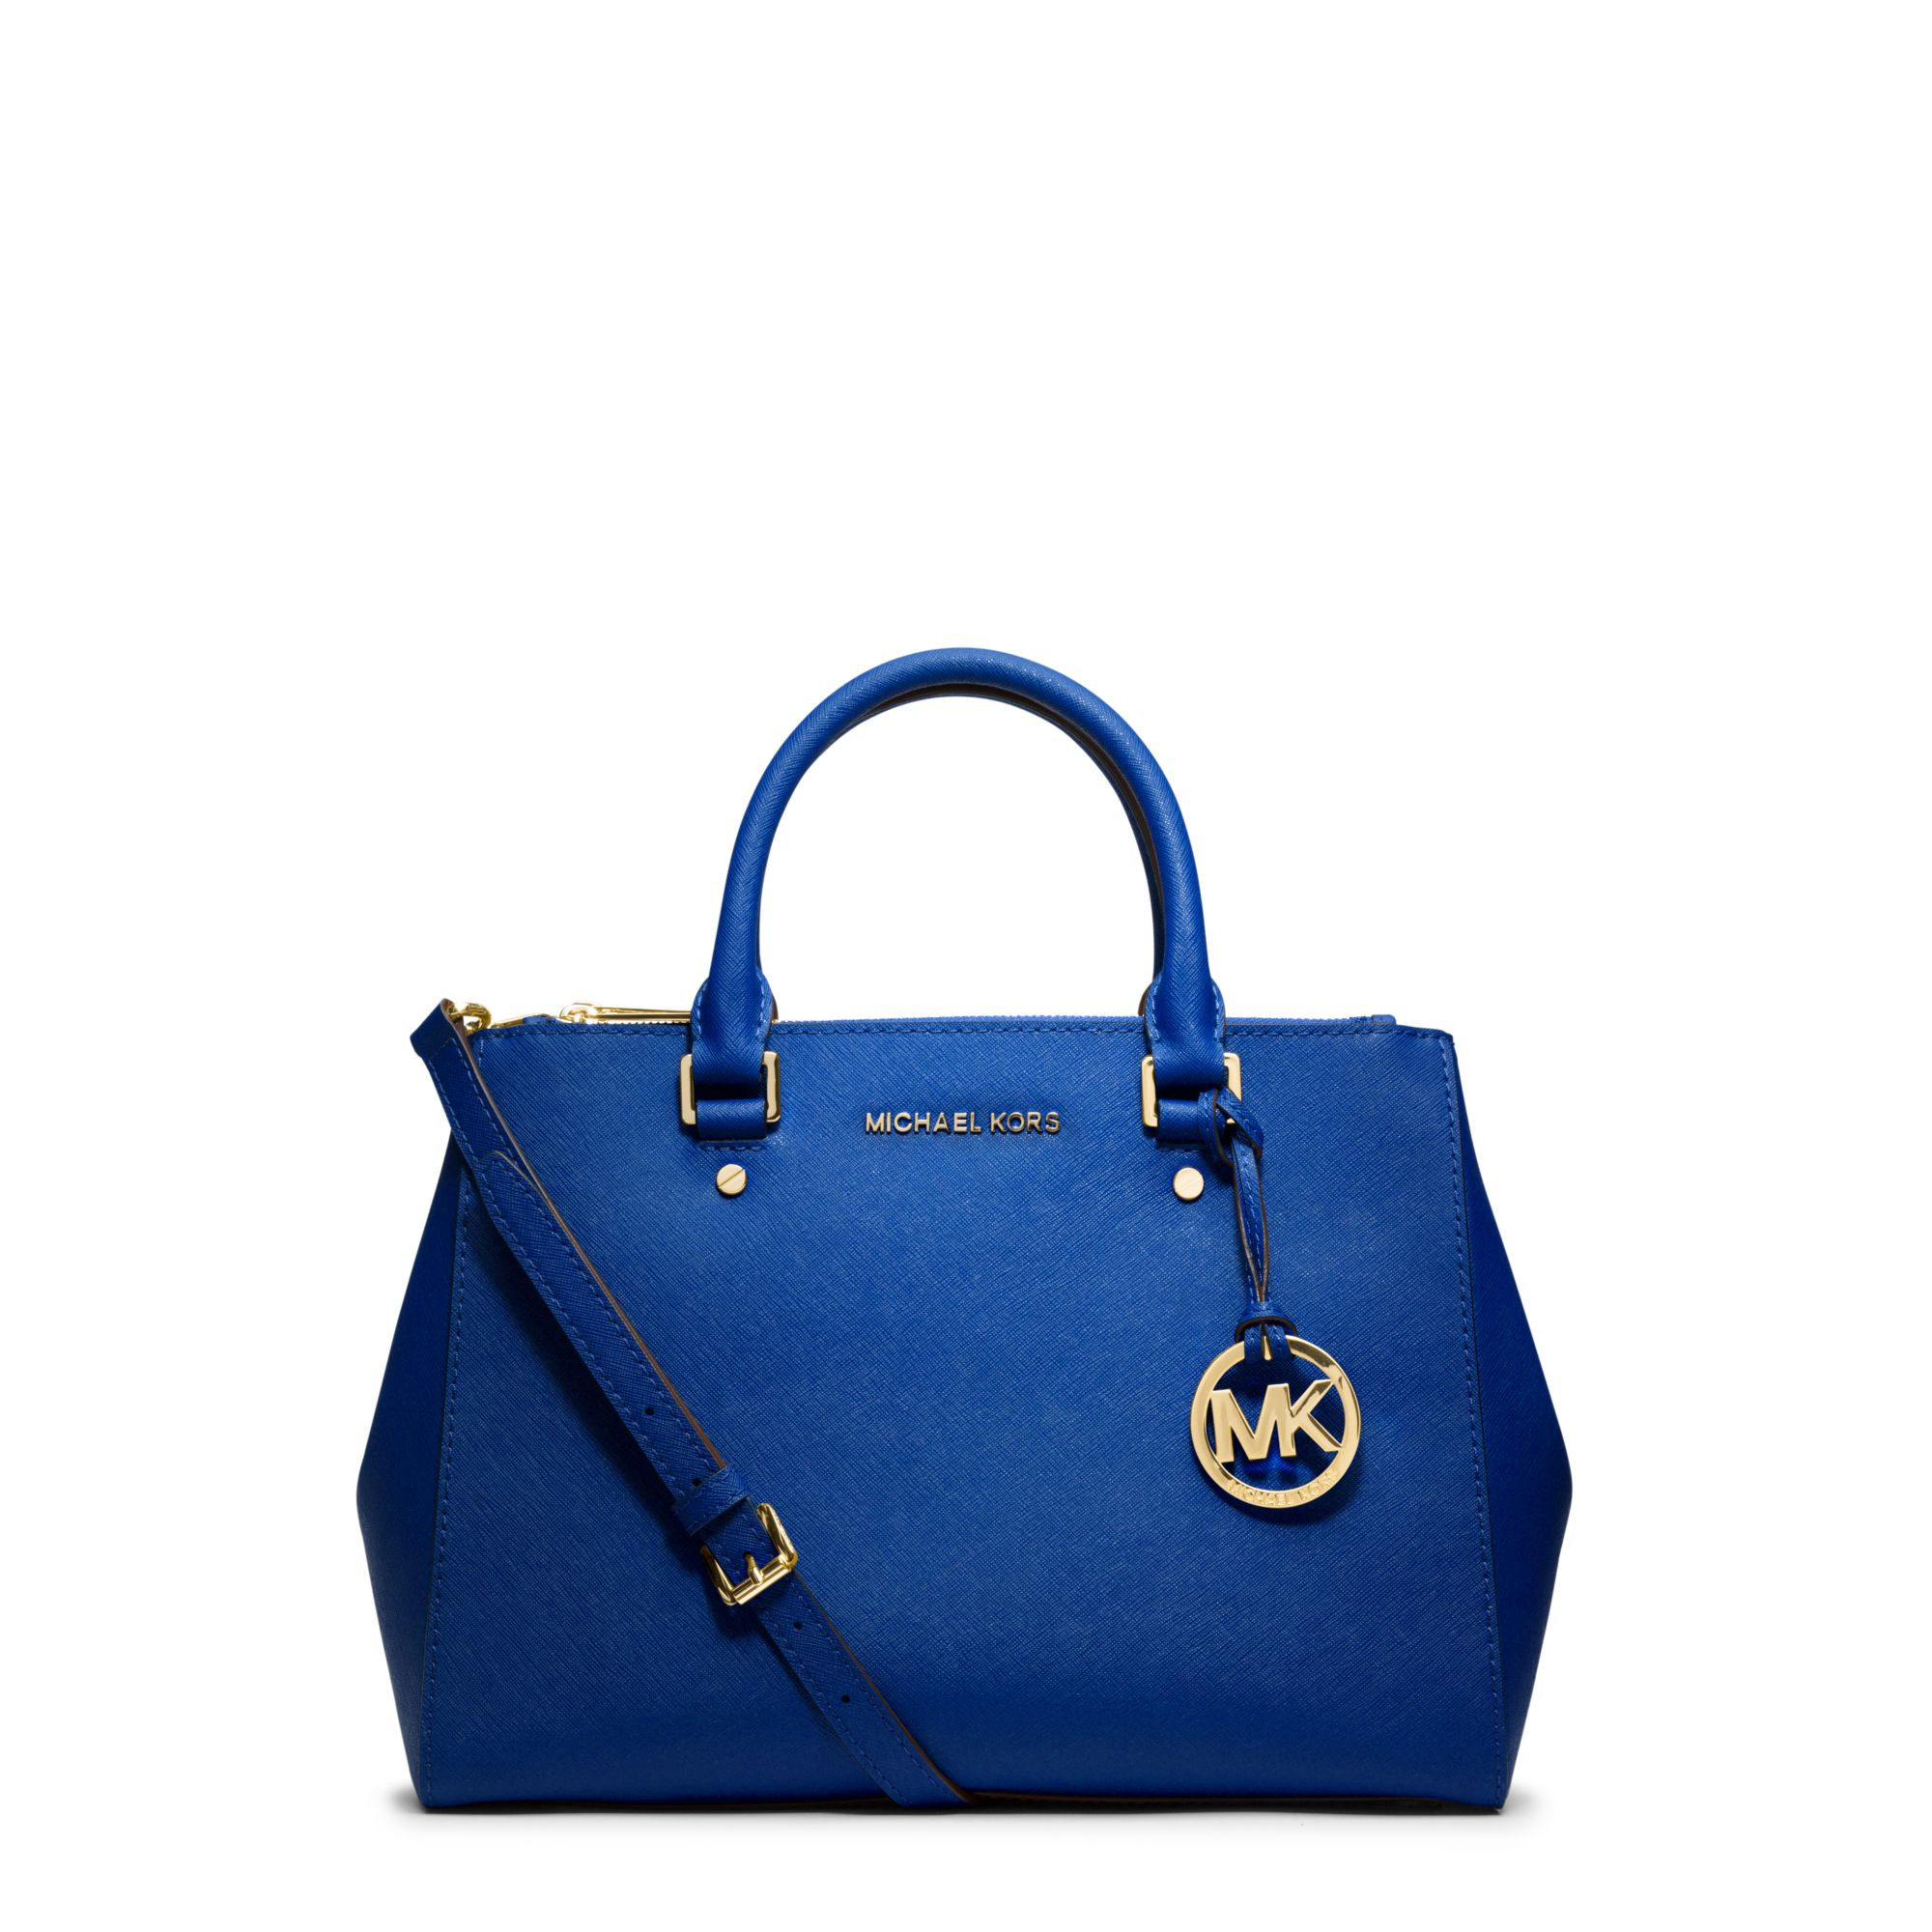 542310b173d5 Michael Kors Sutton Medium Saffiano Leather Satchel in Blue - Lyst